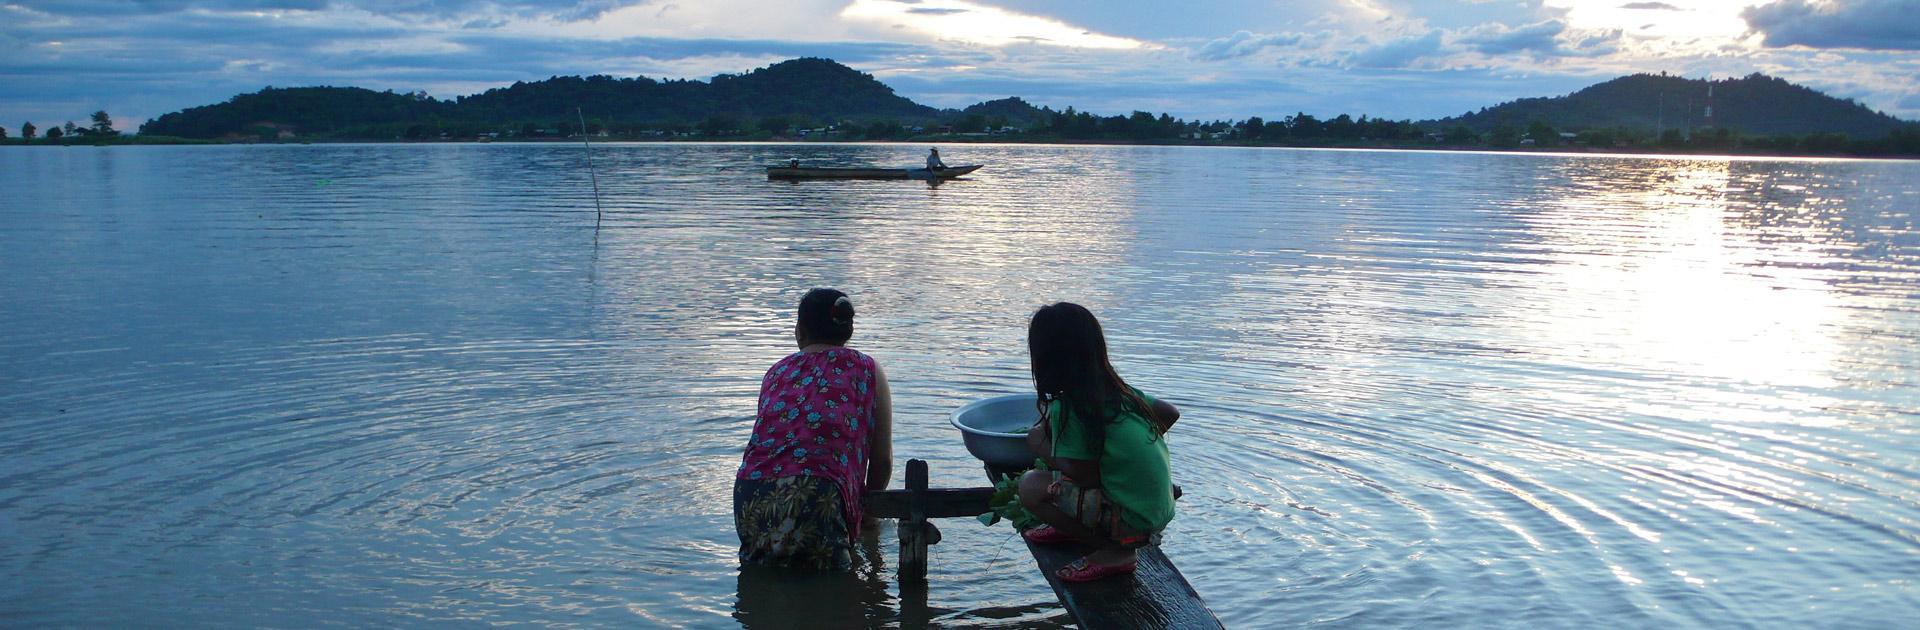 LA Gran Tour de Laos 17 días 2